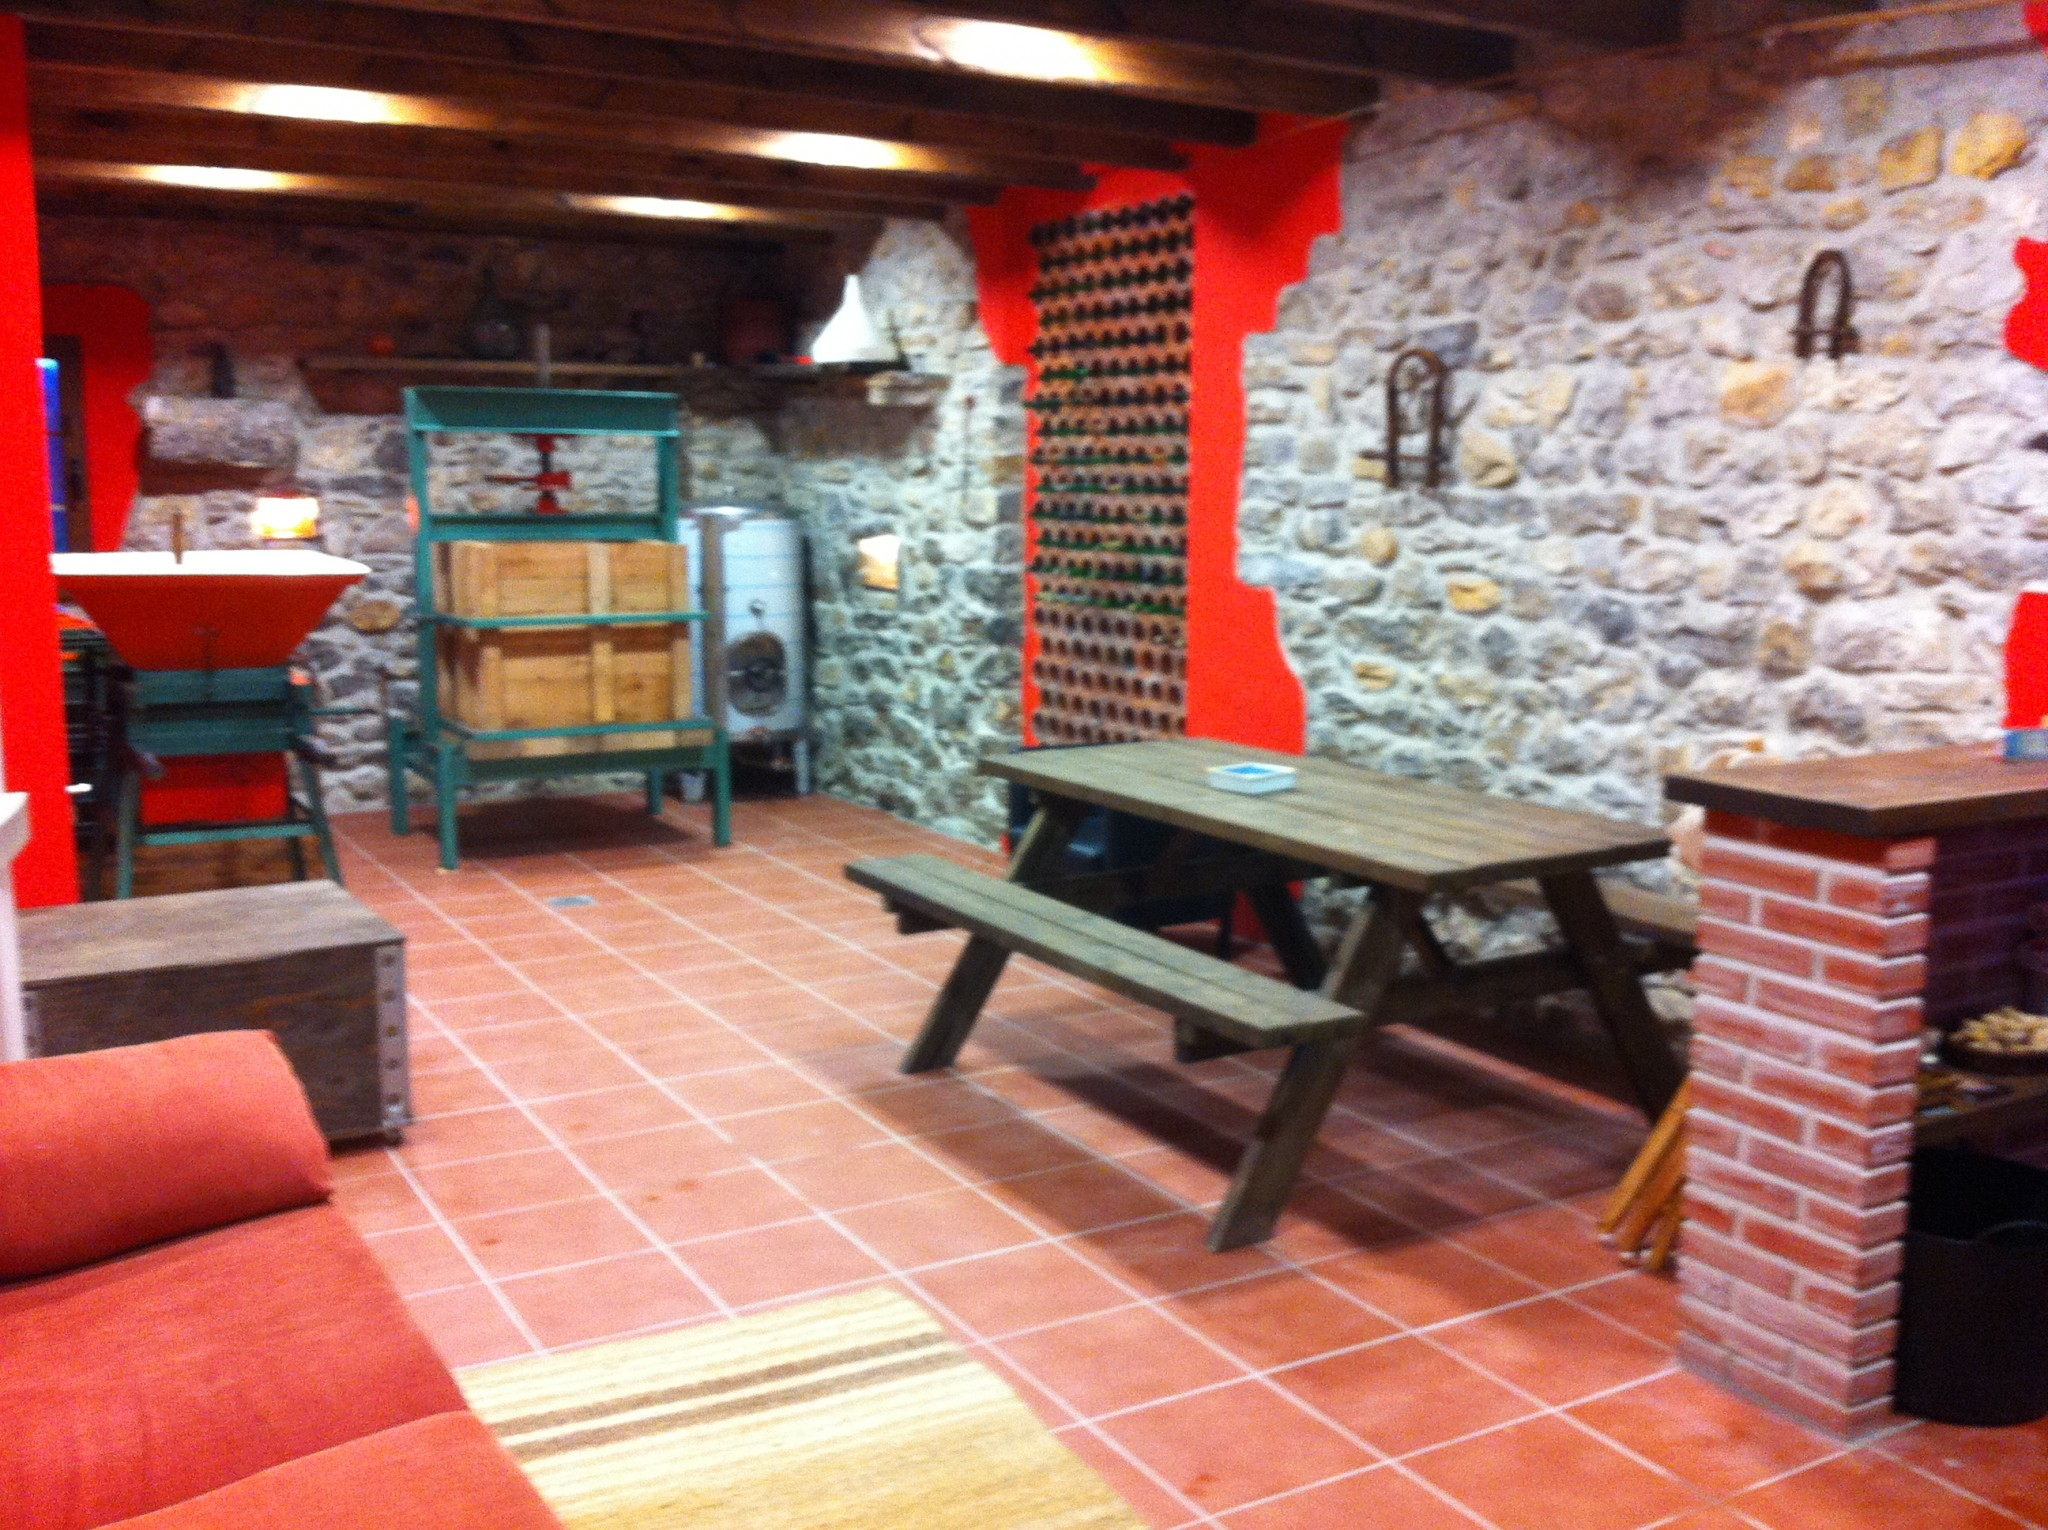 Pressoir à-cidre gìte rural Rincon del Sella